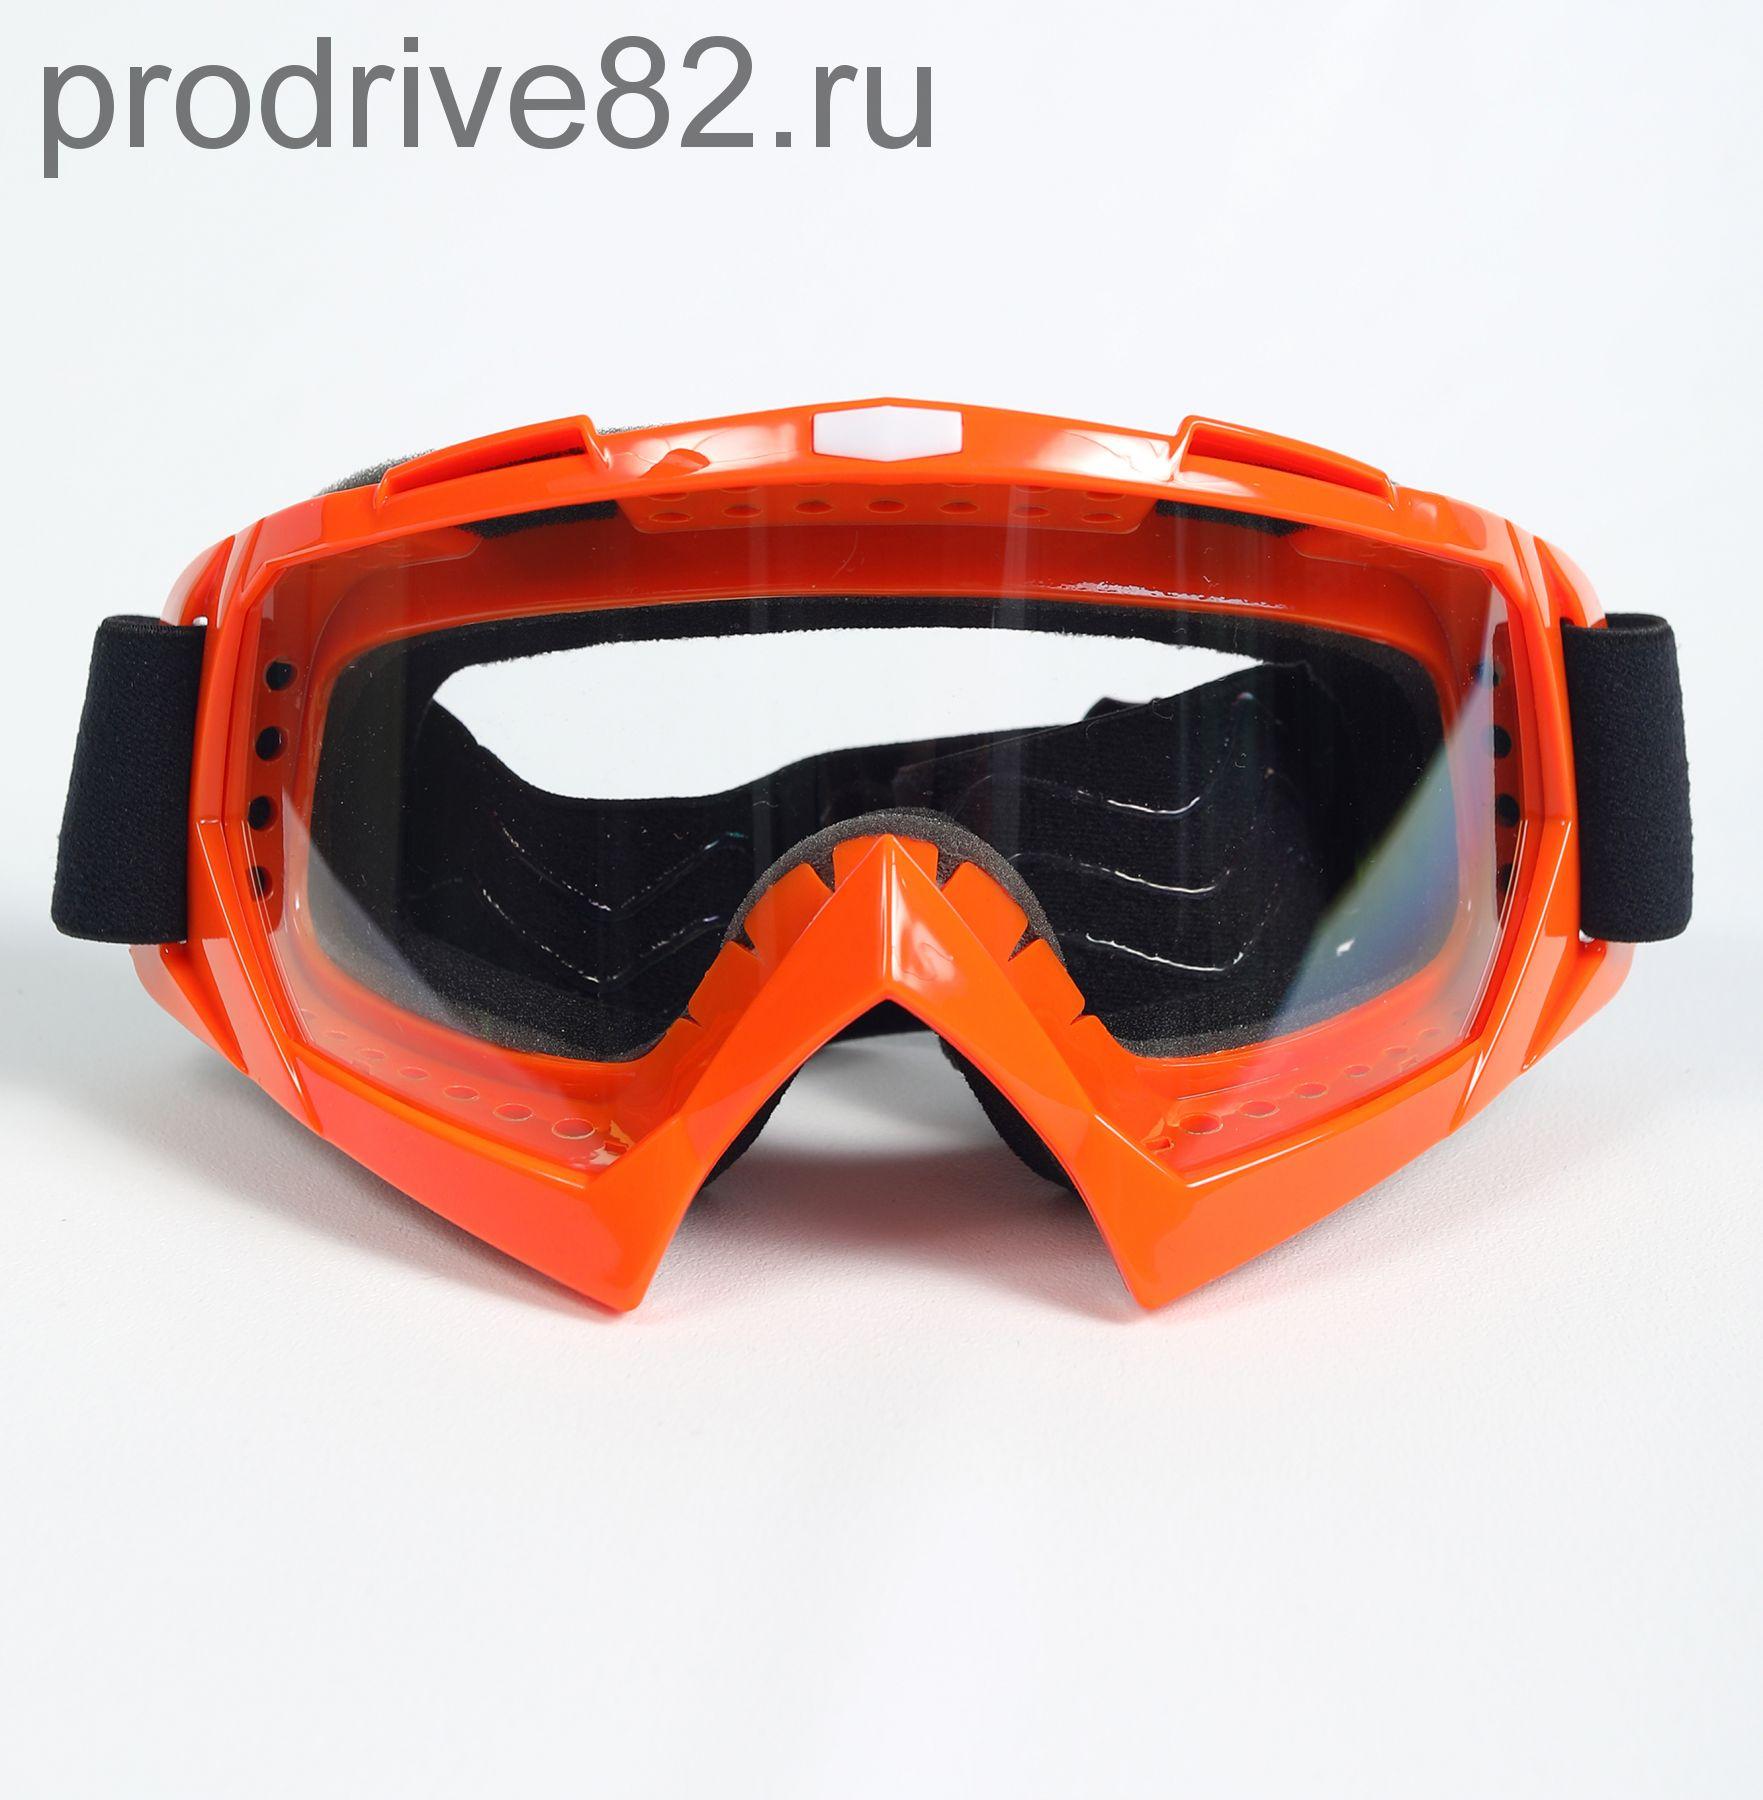 Мото очки М004 Orange